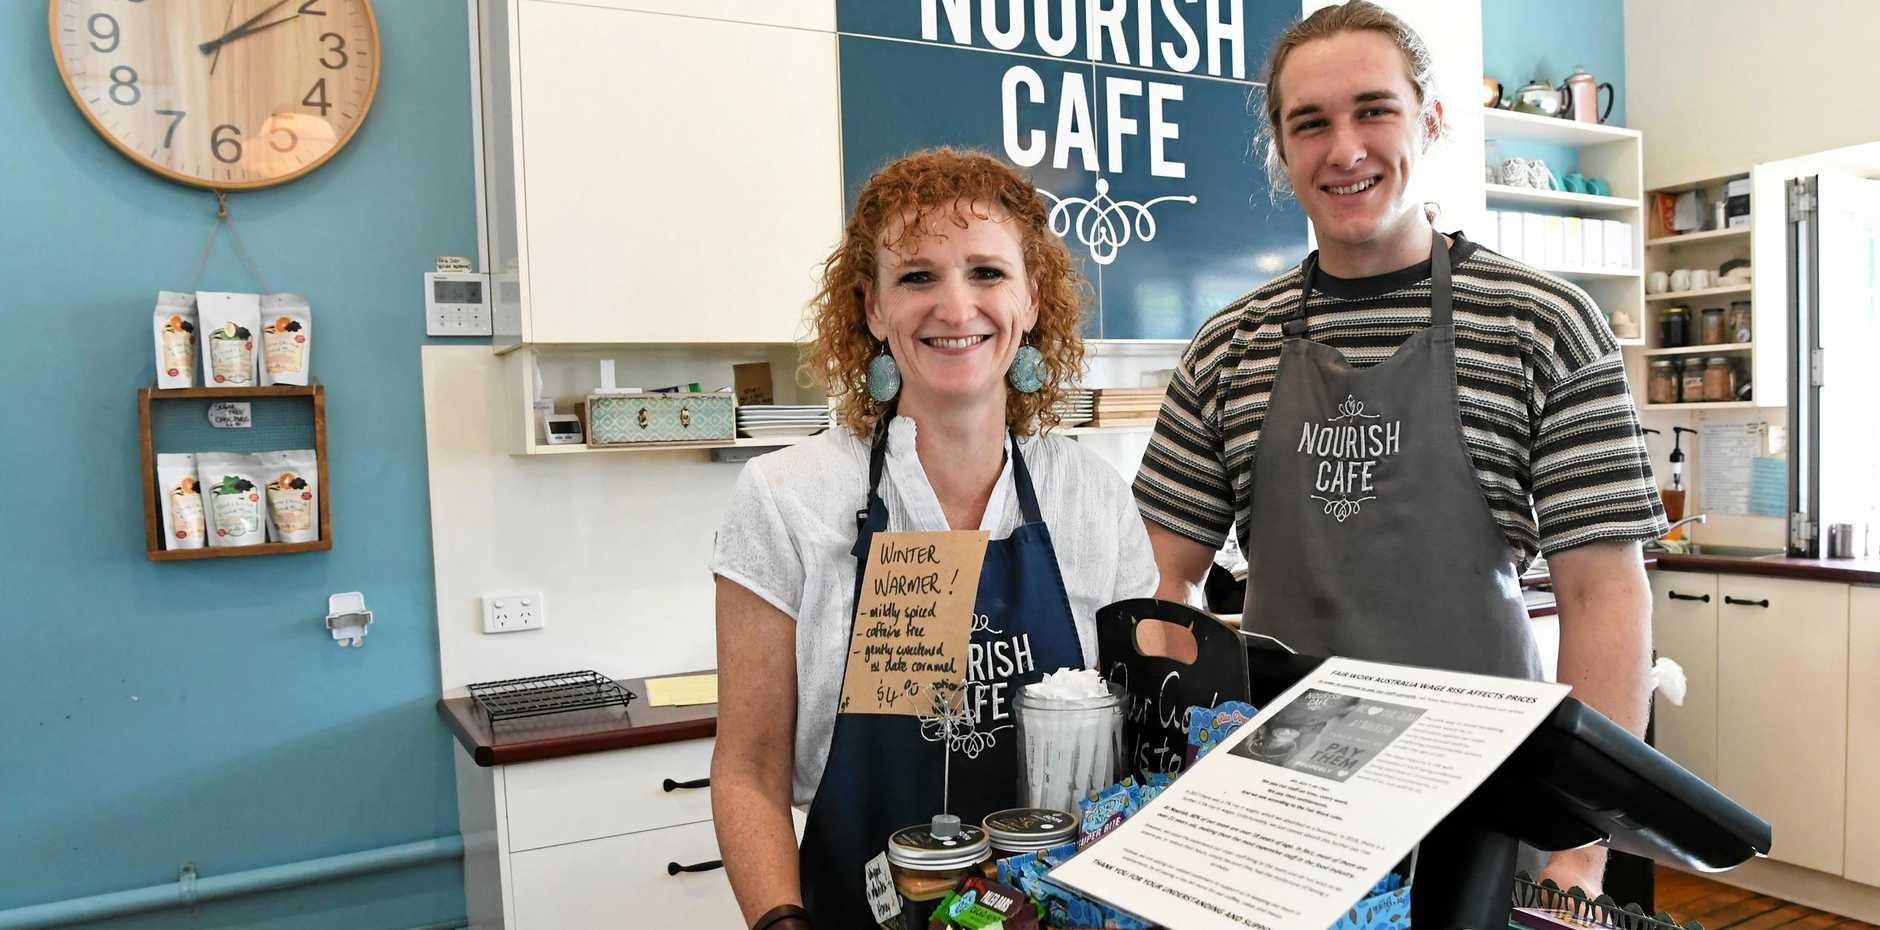 STAFF CARE: Nourish Cafe owner Judy Plath with valued staff member Josh Gaddes.